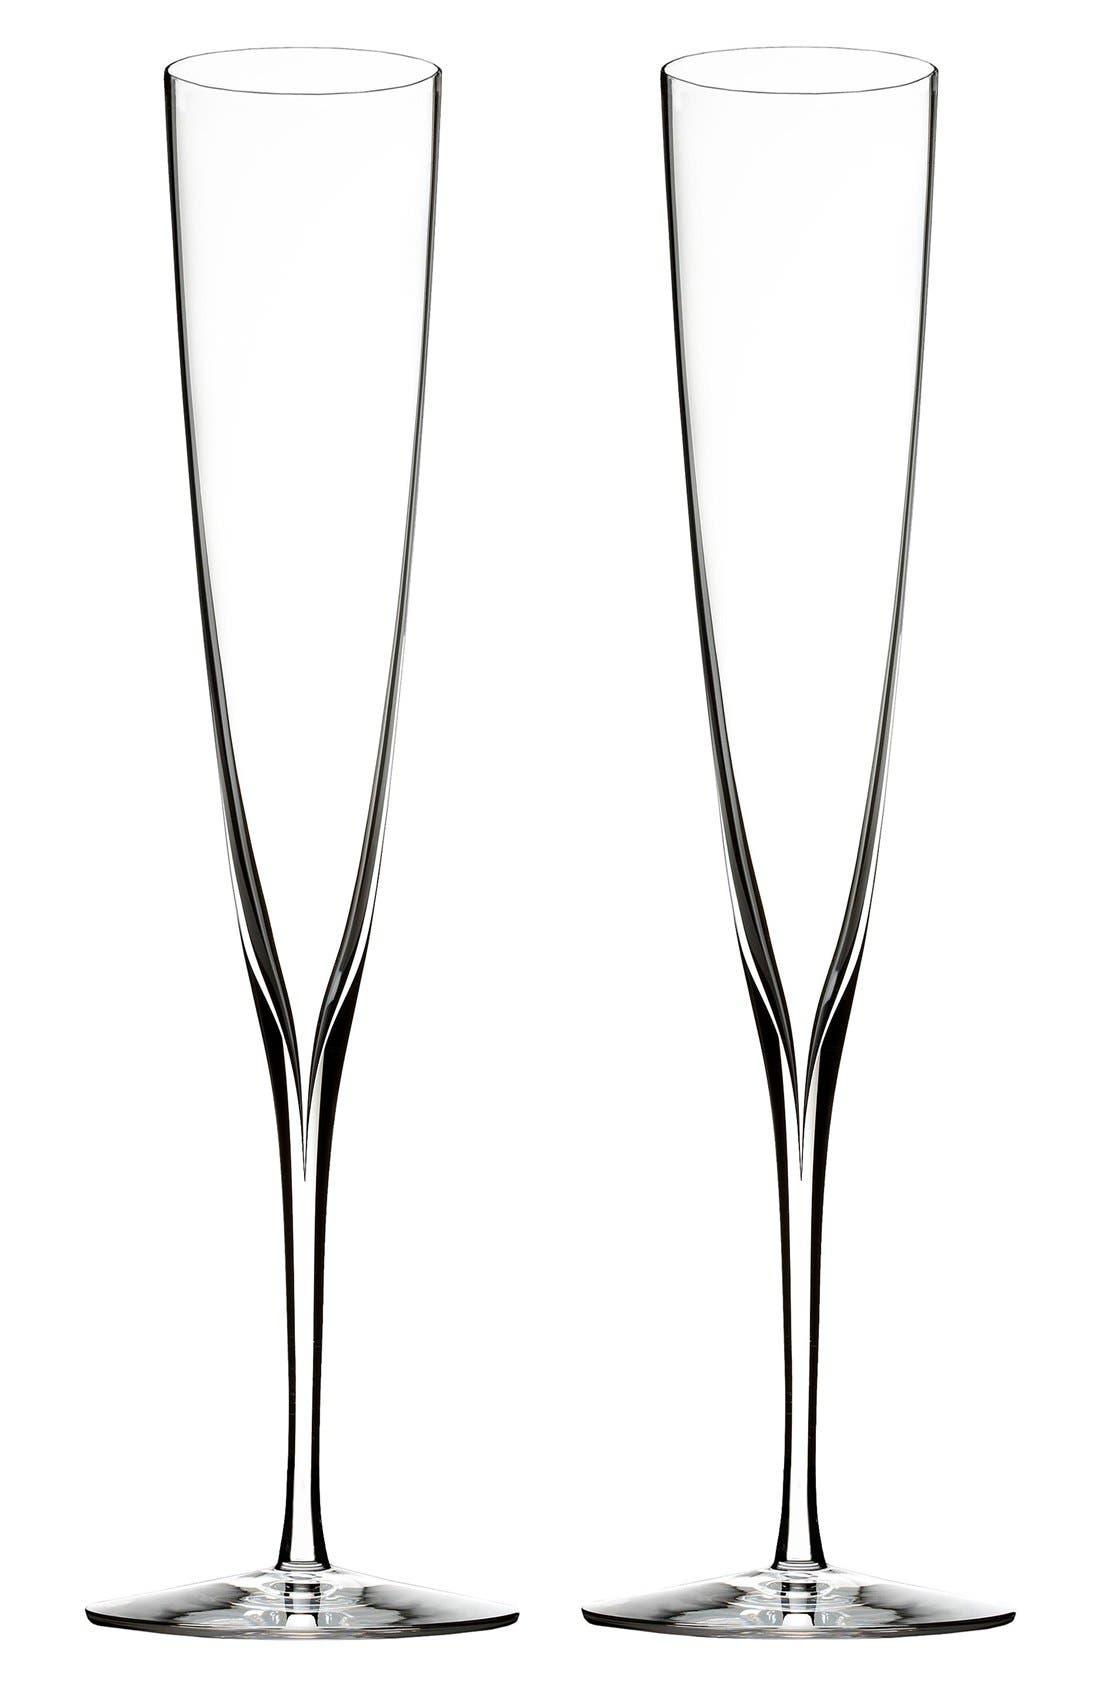 Alternate Image 1 Selected - Waterford 'Elegance' Fine Crystal Champagne Trumpet Flutes (Set of 2)